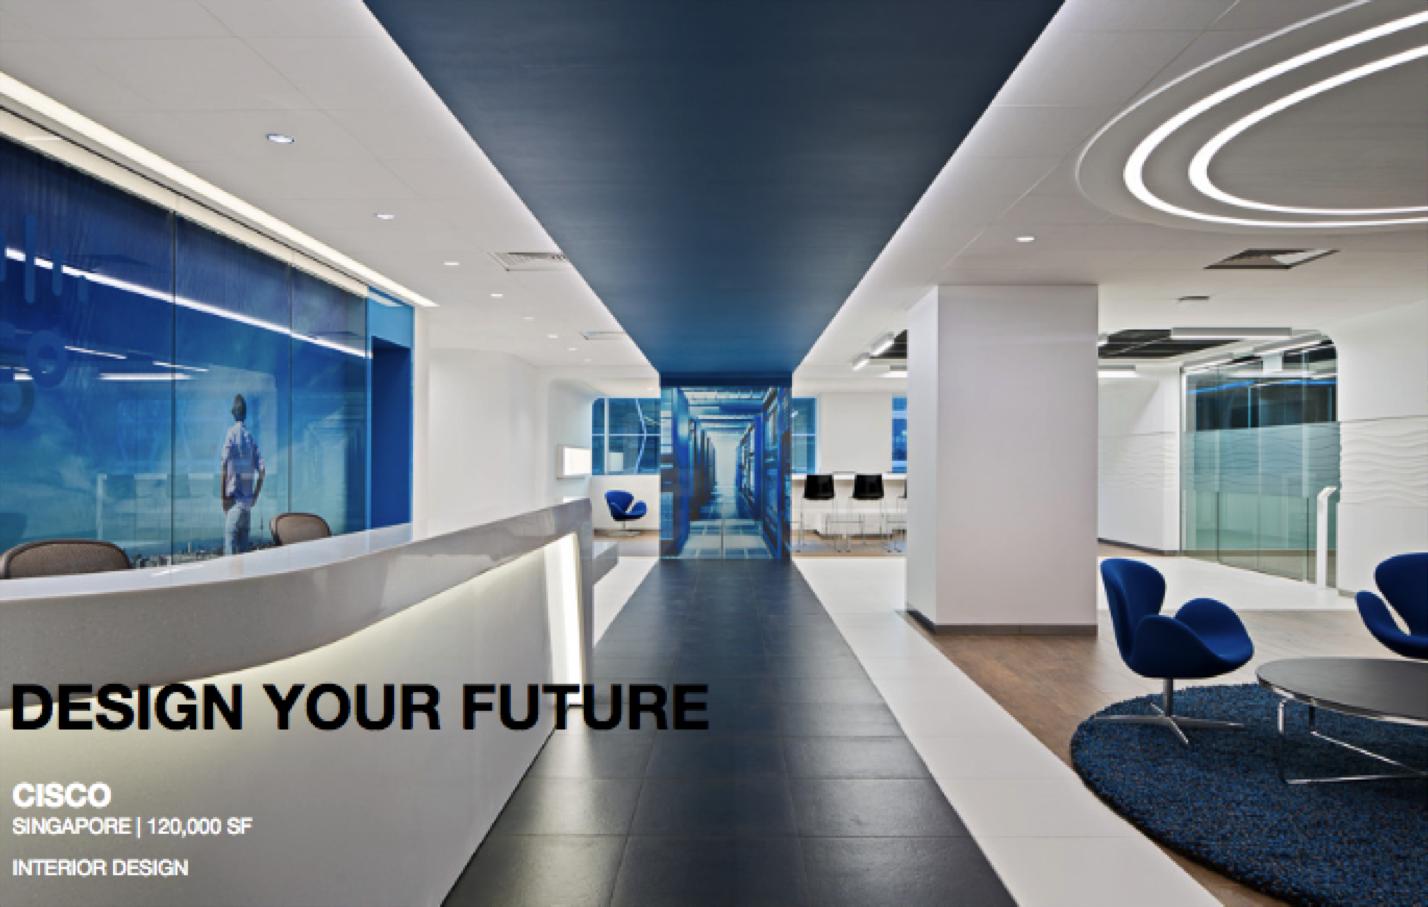 Space matrix design consultants jobs solution architect for Interior design consultant jobs